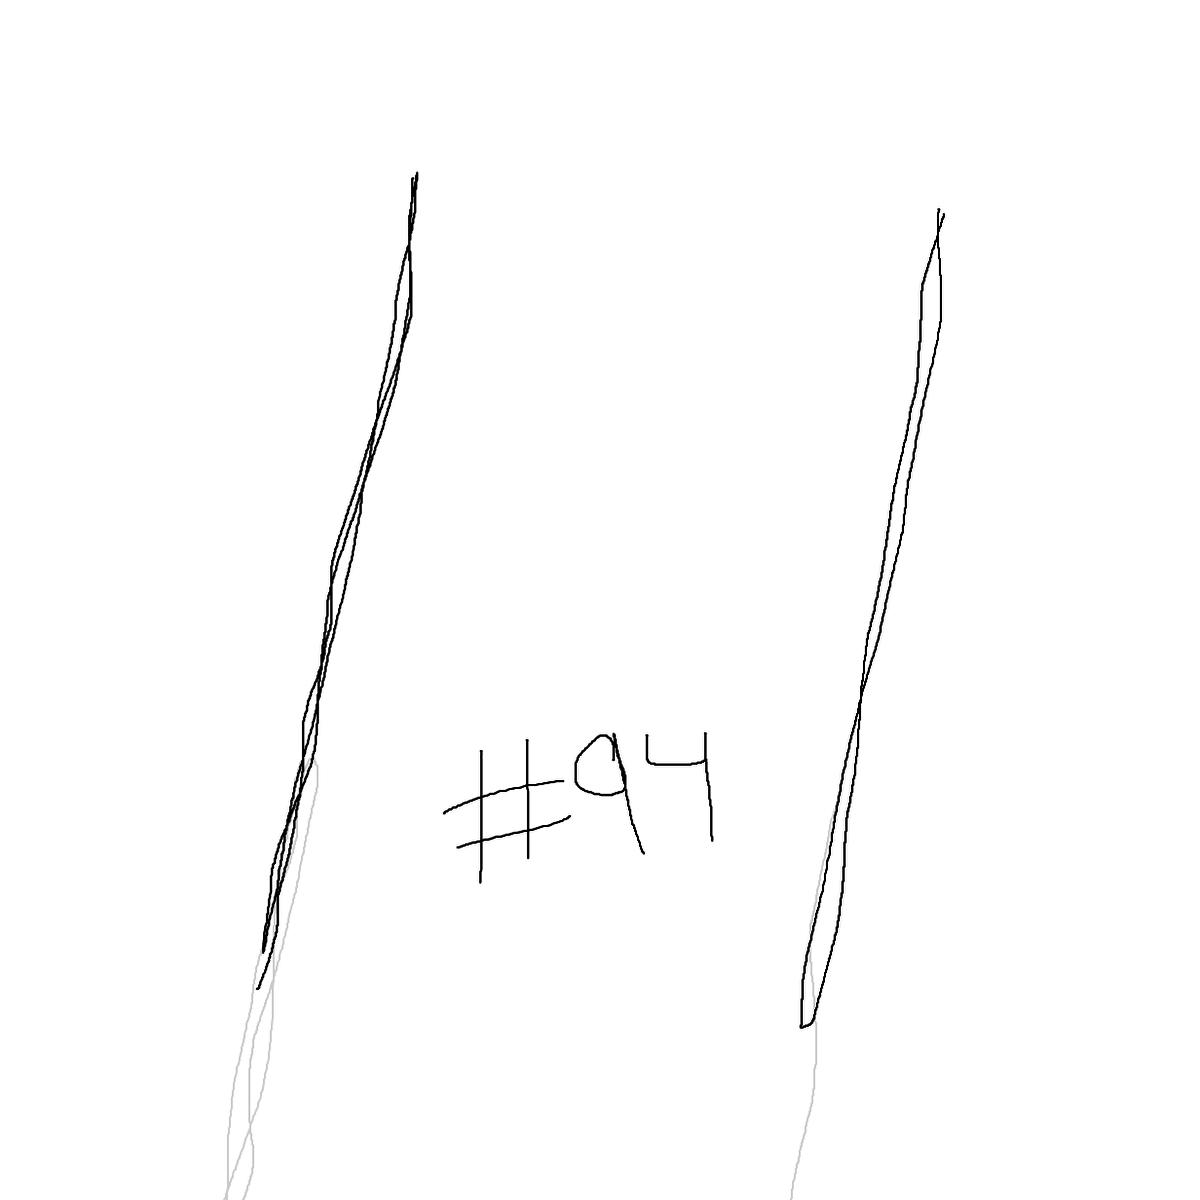 BAAAM drawing#13302 lat:38.2045555114746100lng: -85.7571182250976600